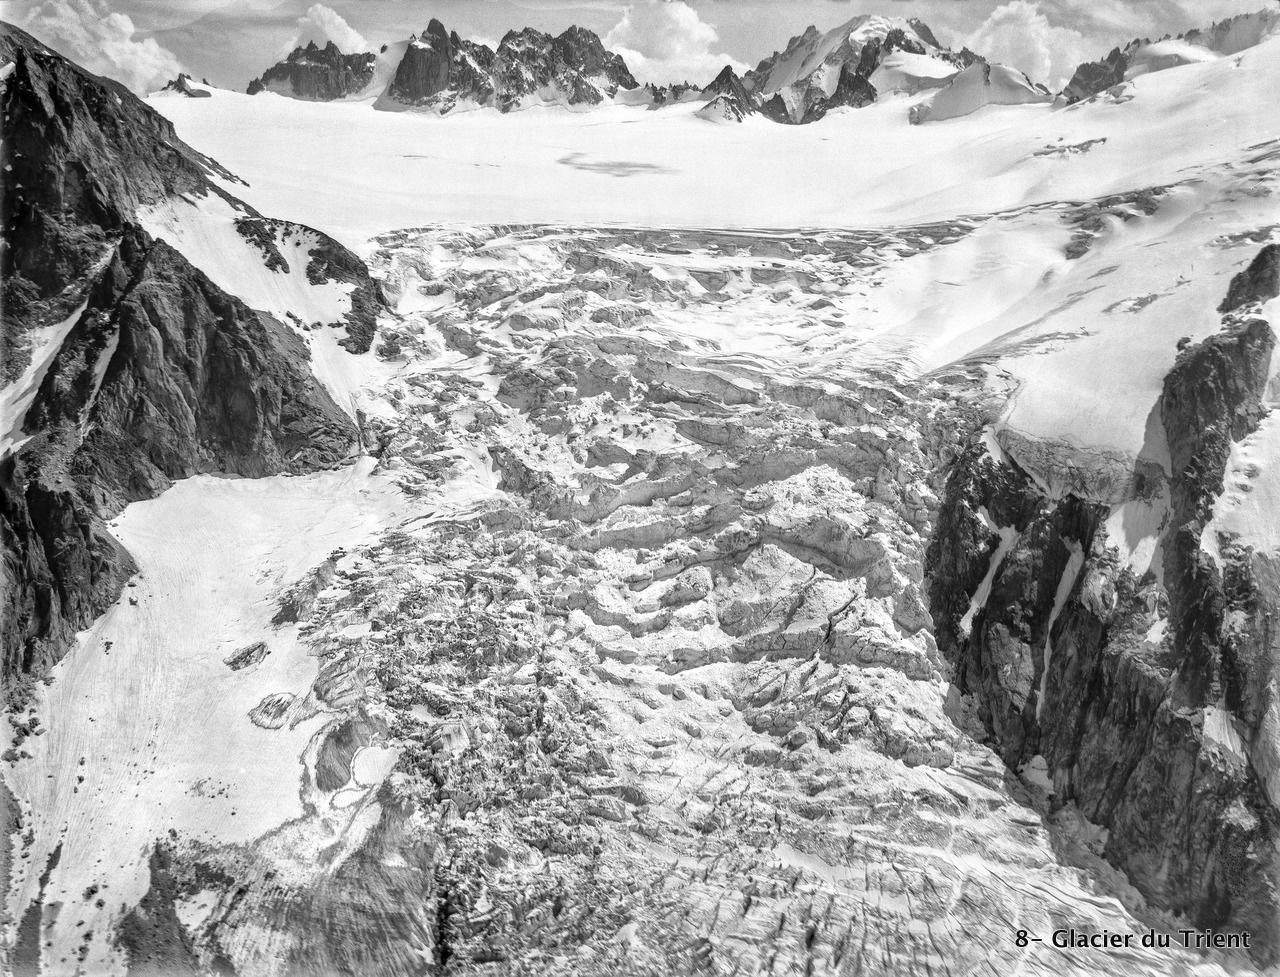 CH-NB_-_Glacier_du_Trient_-_Eduard_Spelterini_-_EAD-WEHR-32066-B.tif